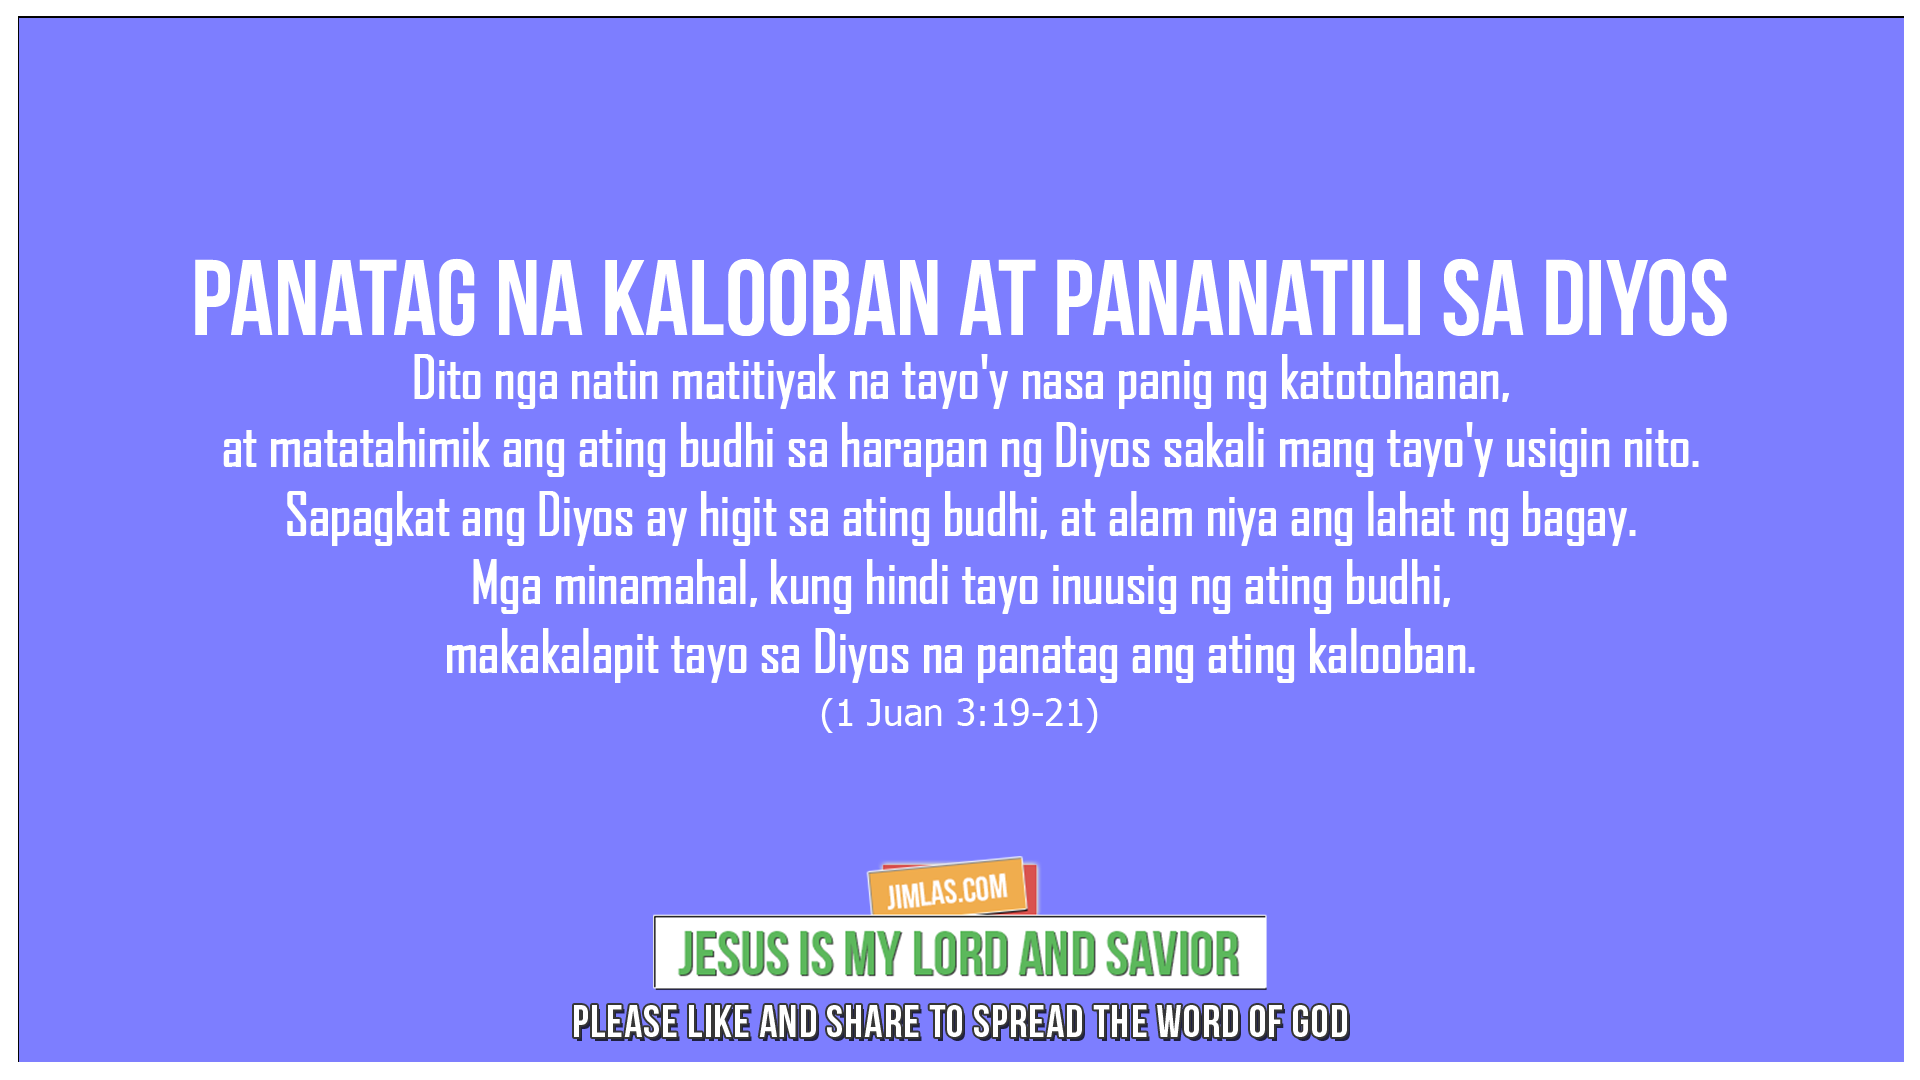 1 Juan 3:19-21, 1 Juan 3:19-21